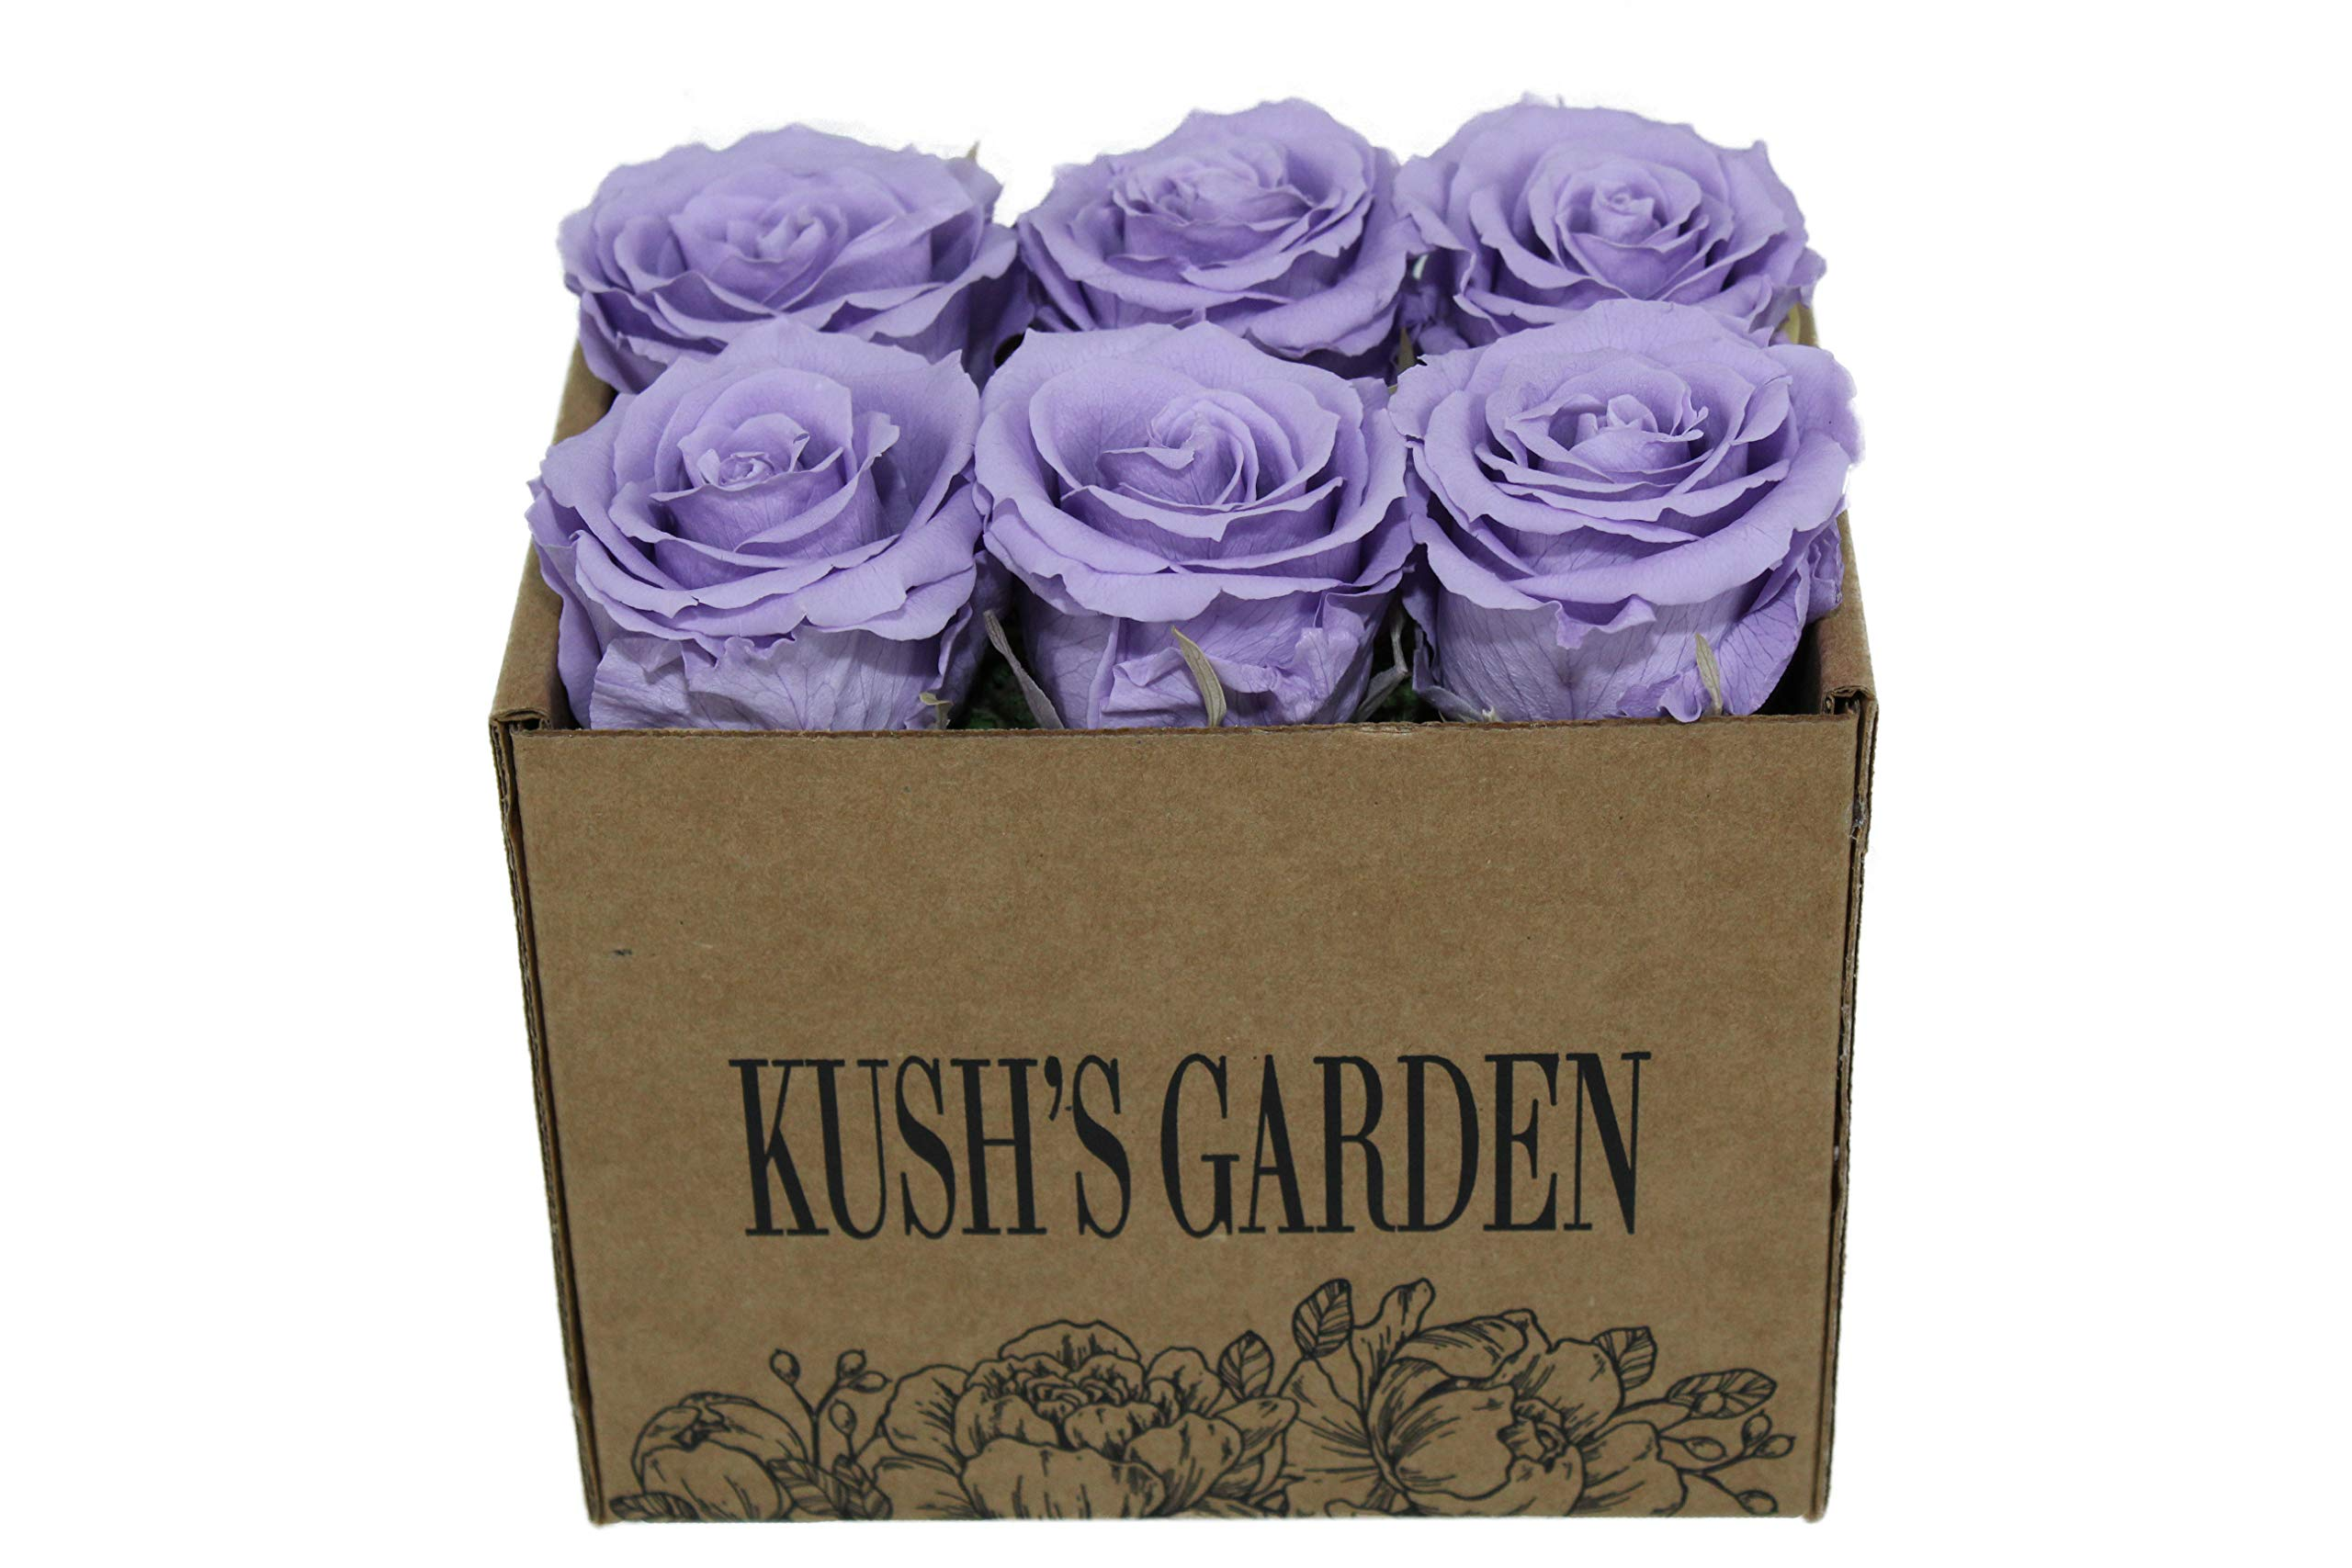 KUSHS GARDEN Real Preserved Roses in Box (Purple Haze)